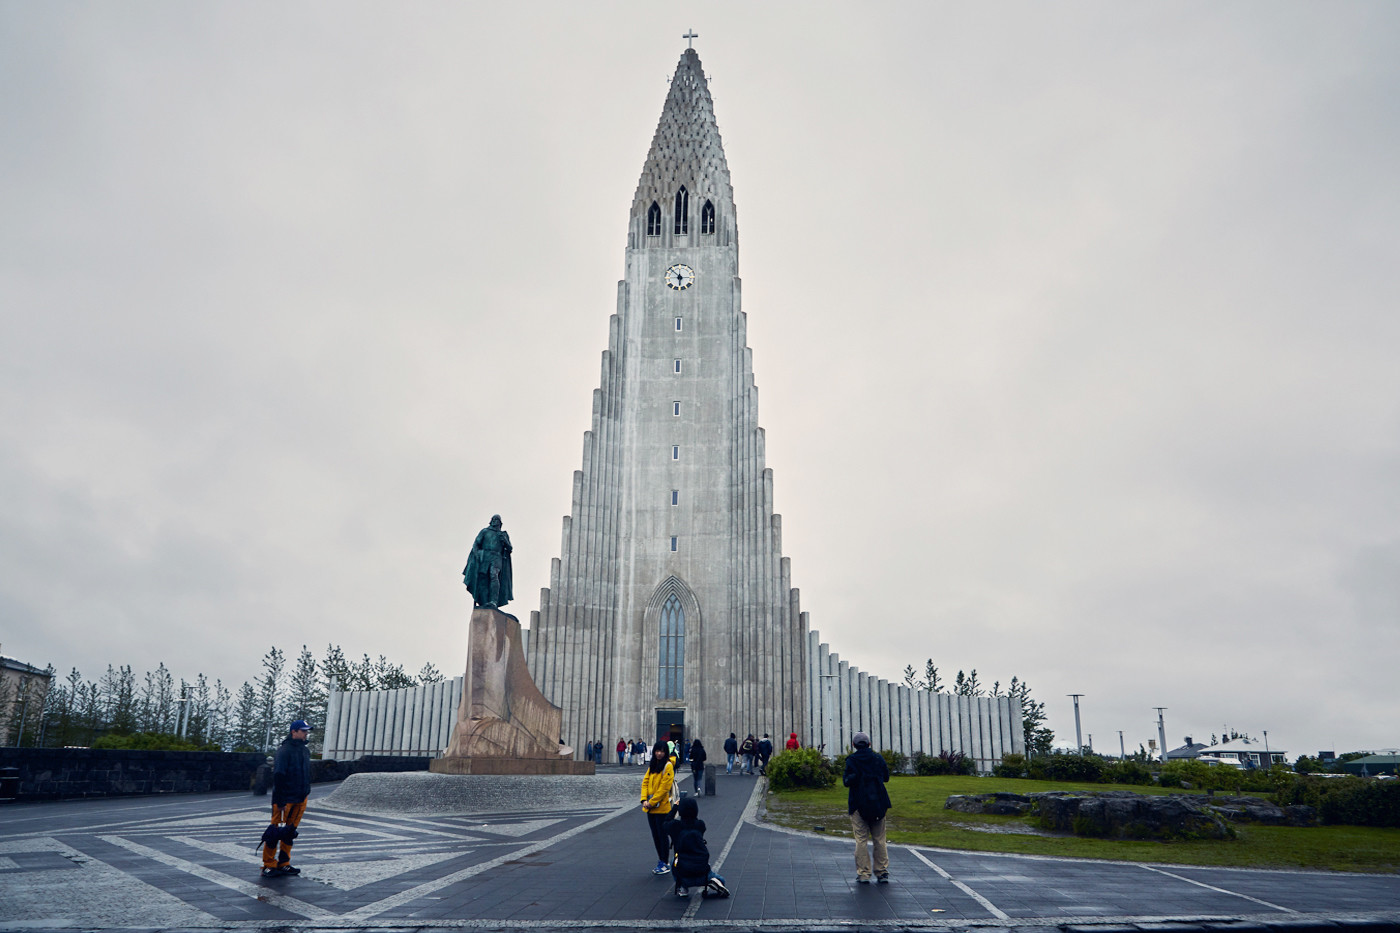 Reykjavik, Iceland, Island, things to do, rainy day, Regentag, Städtetrip, Roadtrip, Reiseblog, travelblog, Kirche,